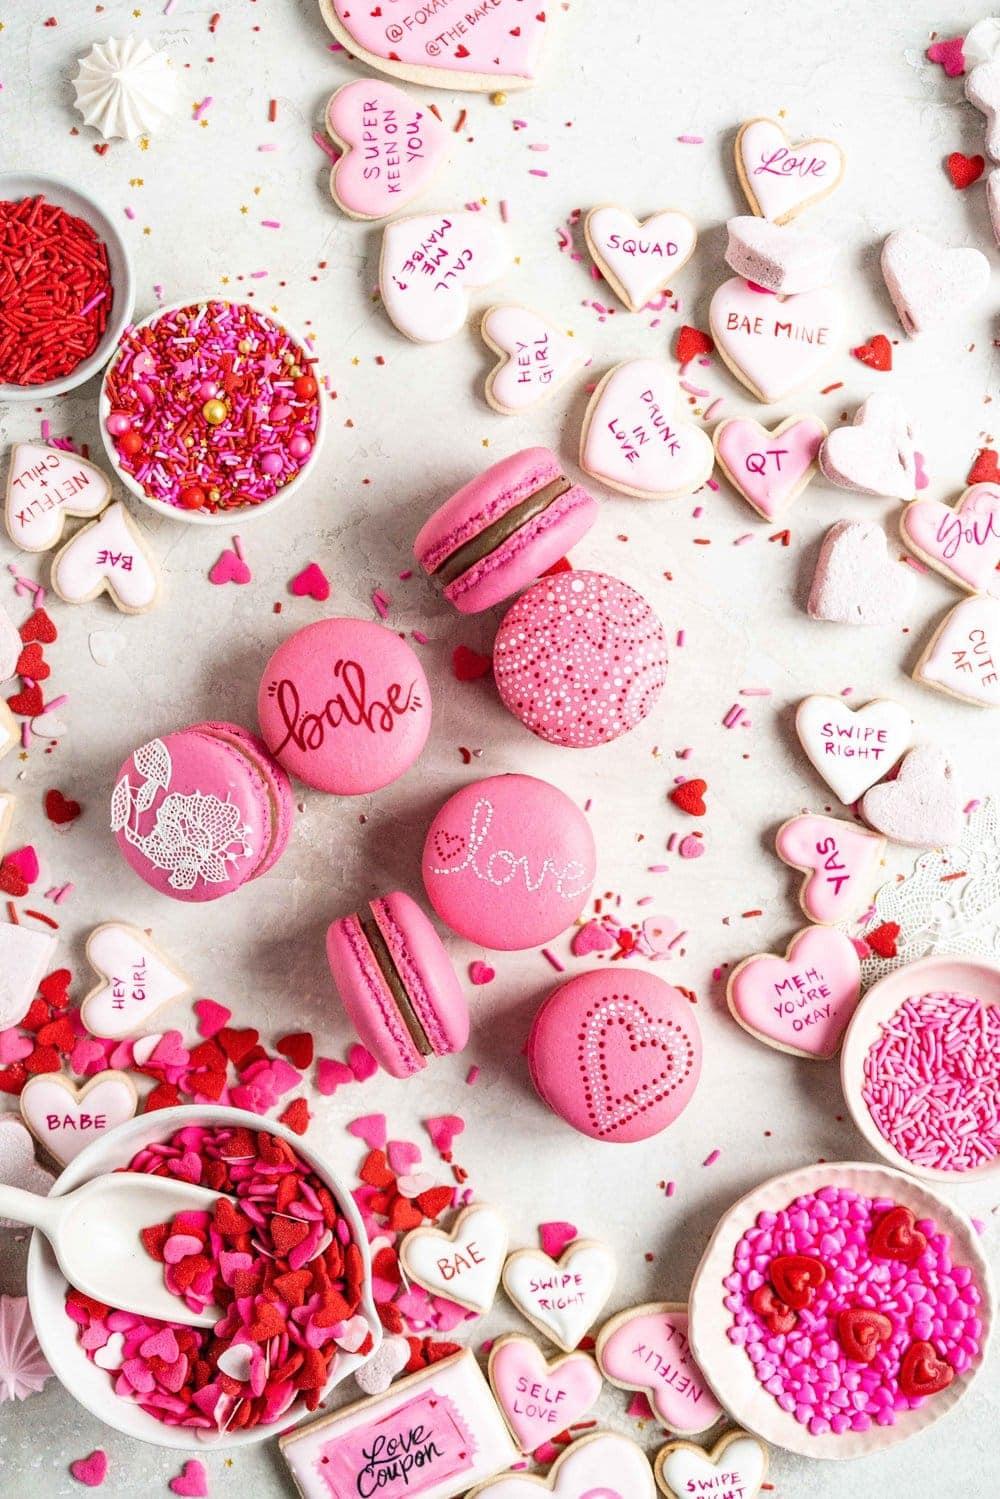 Valentines' day macarons